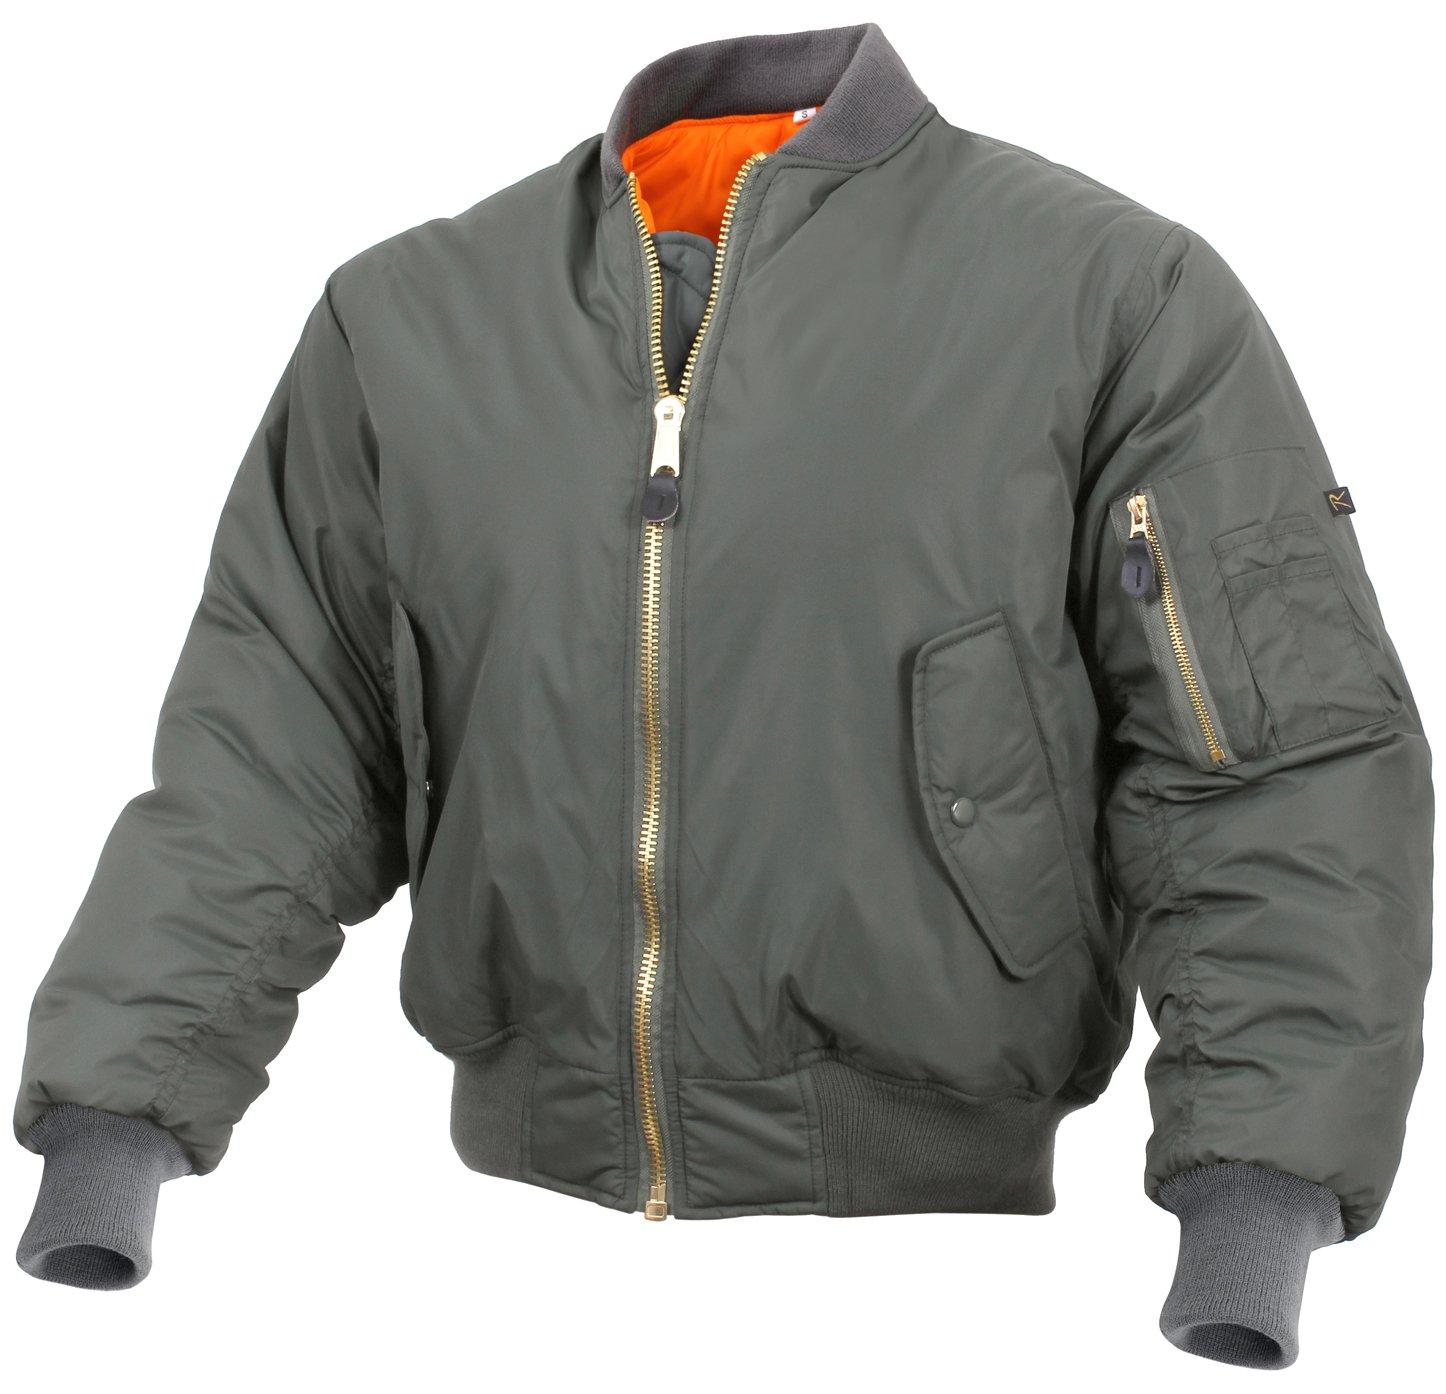 Rothco Enhanced Nylon MA-1 Flight Jacket, M, Sage Green